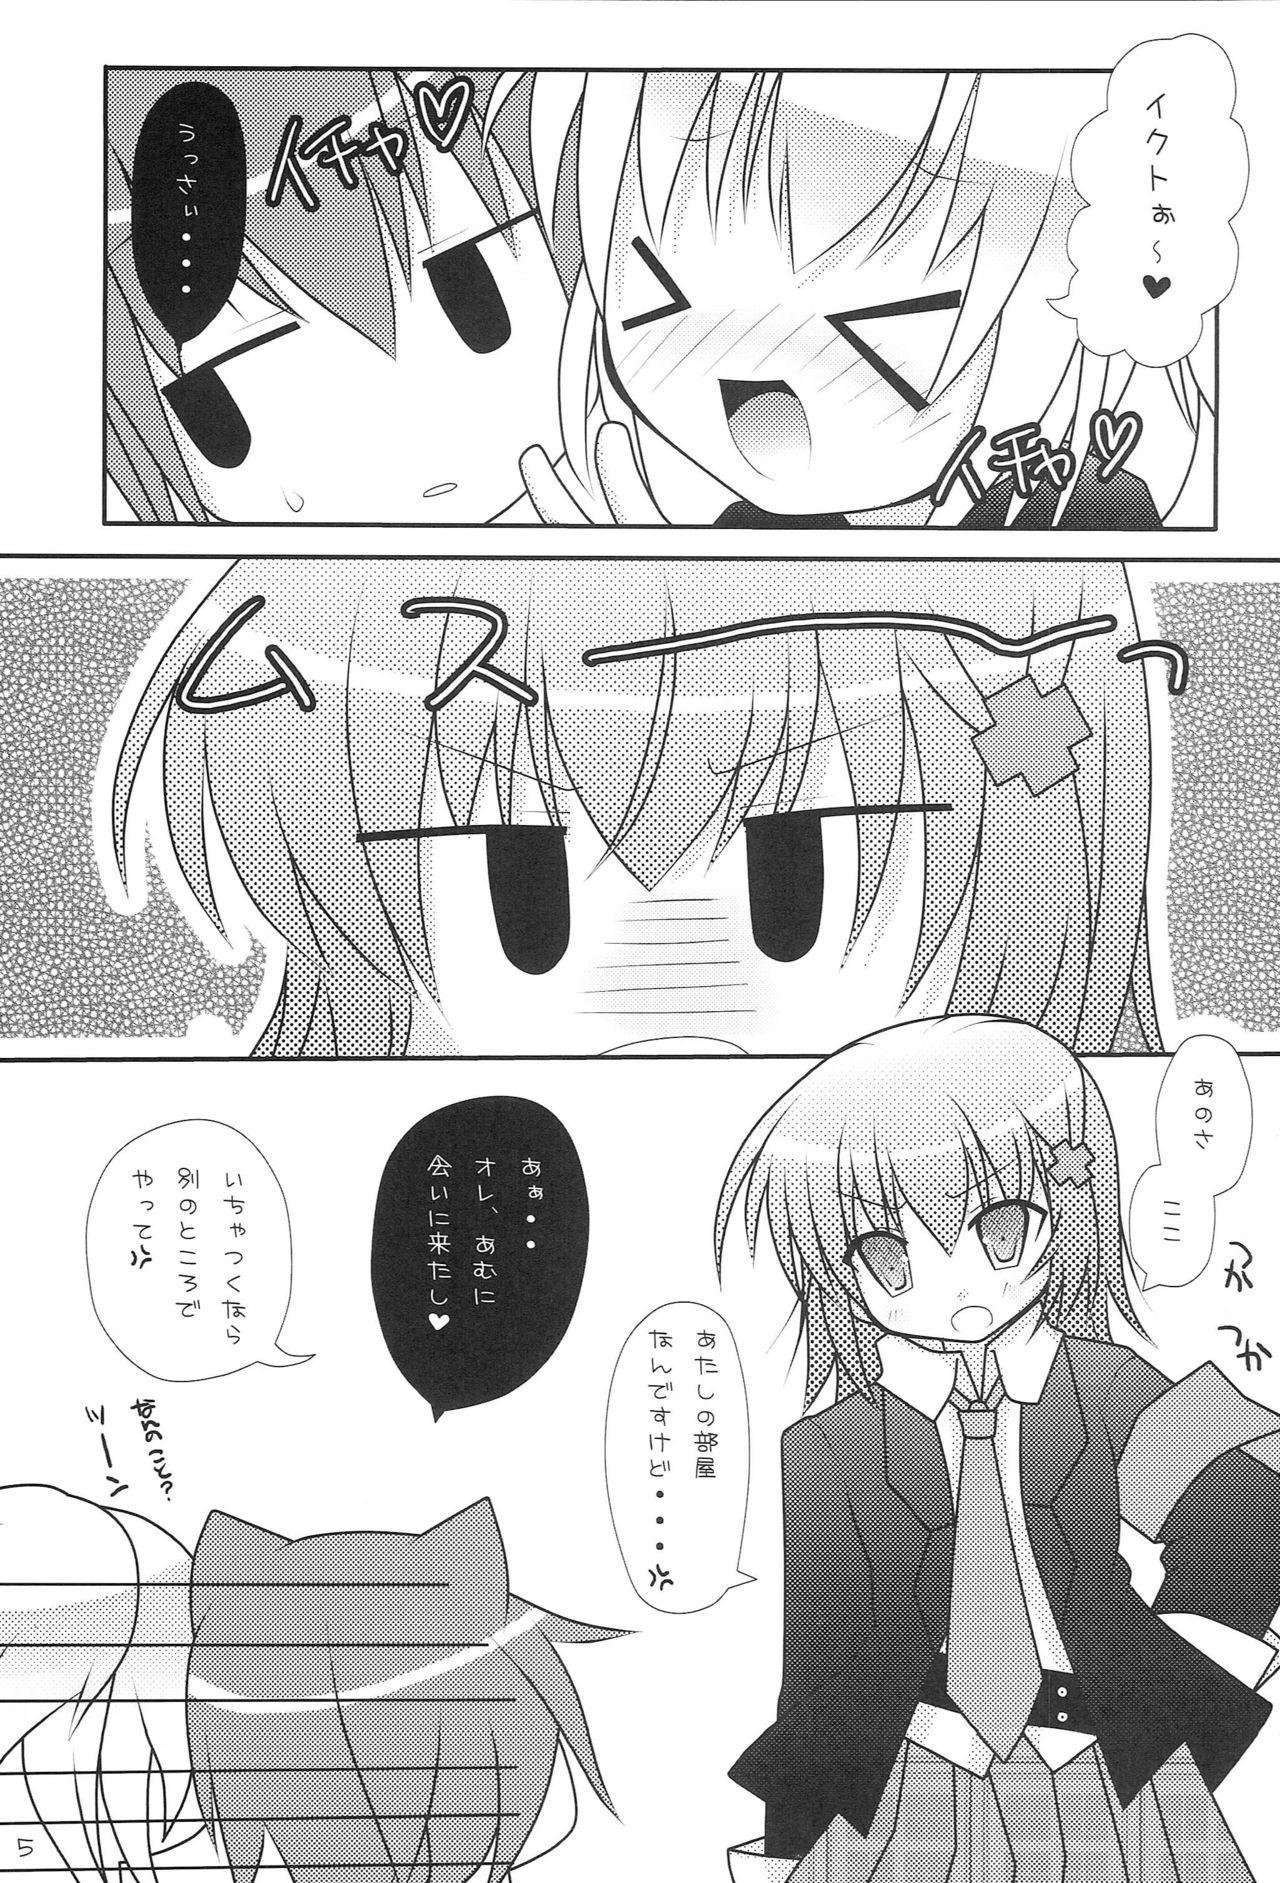 Konomi wa Docchi? 3